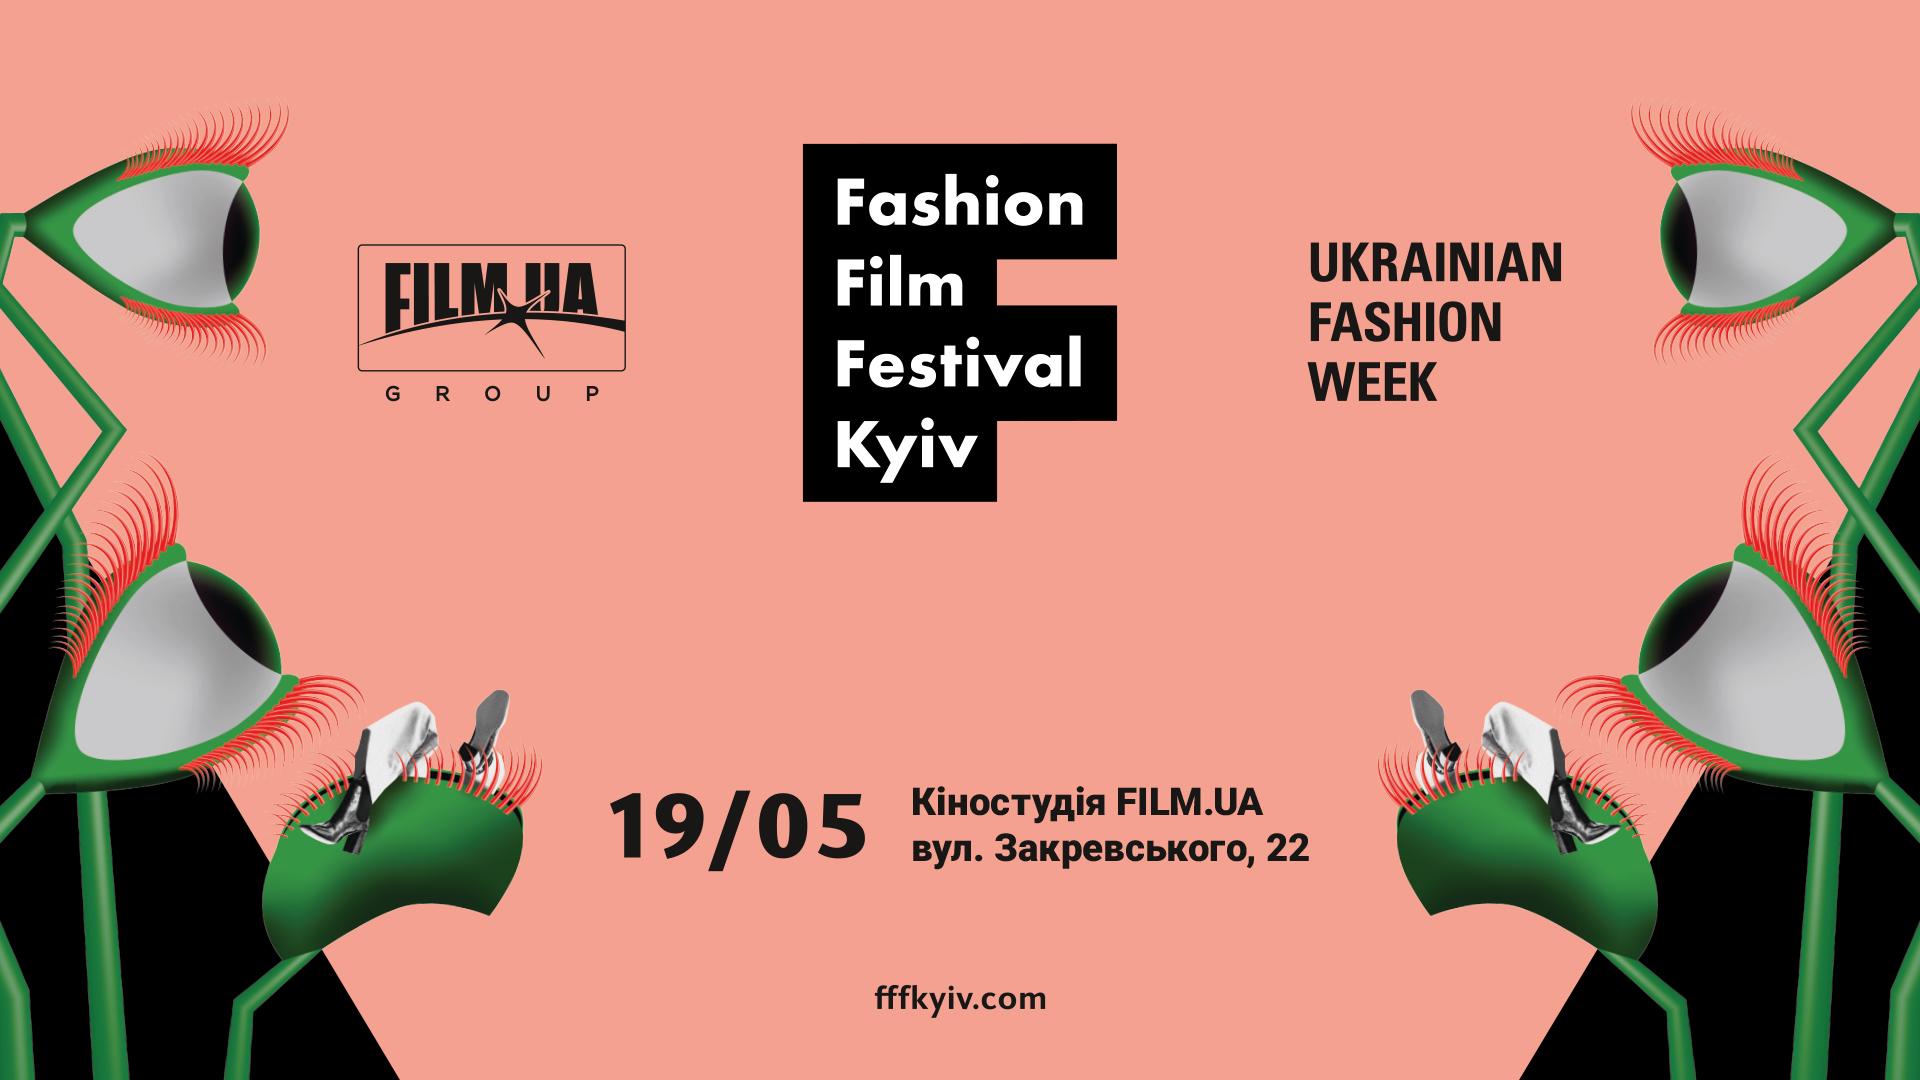 Оголошено програму Fashion Film Festival Kyiv